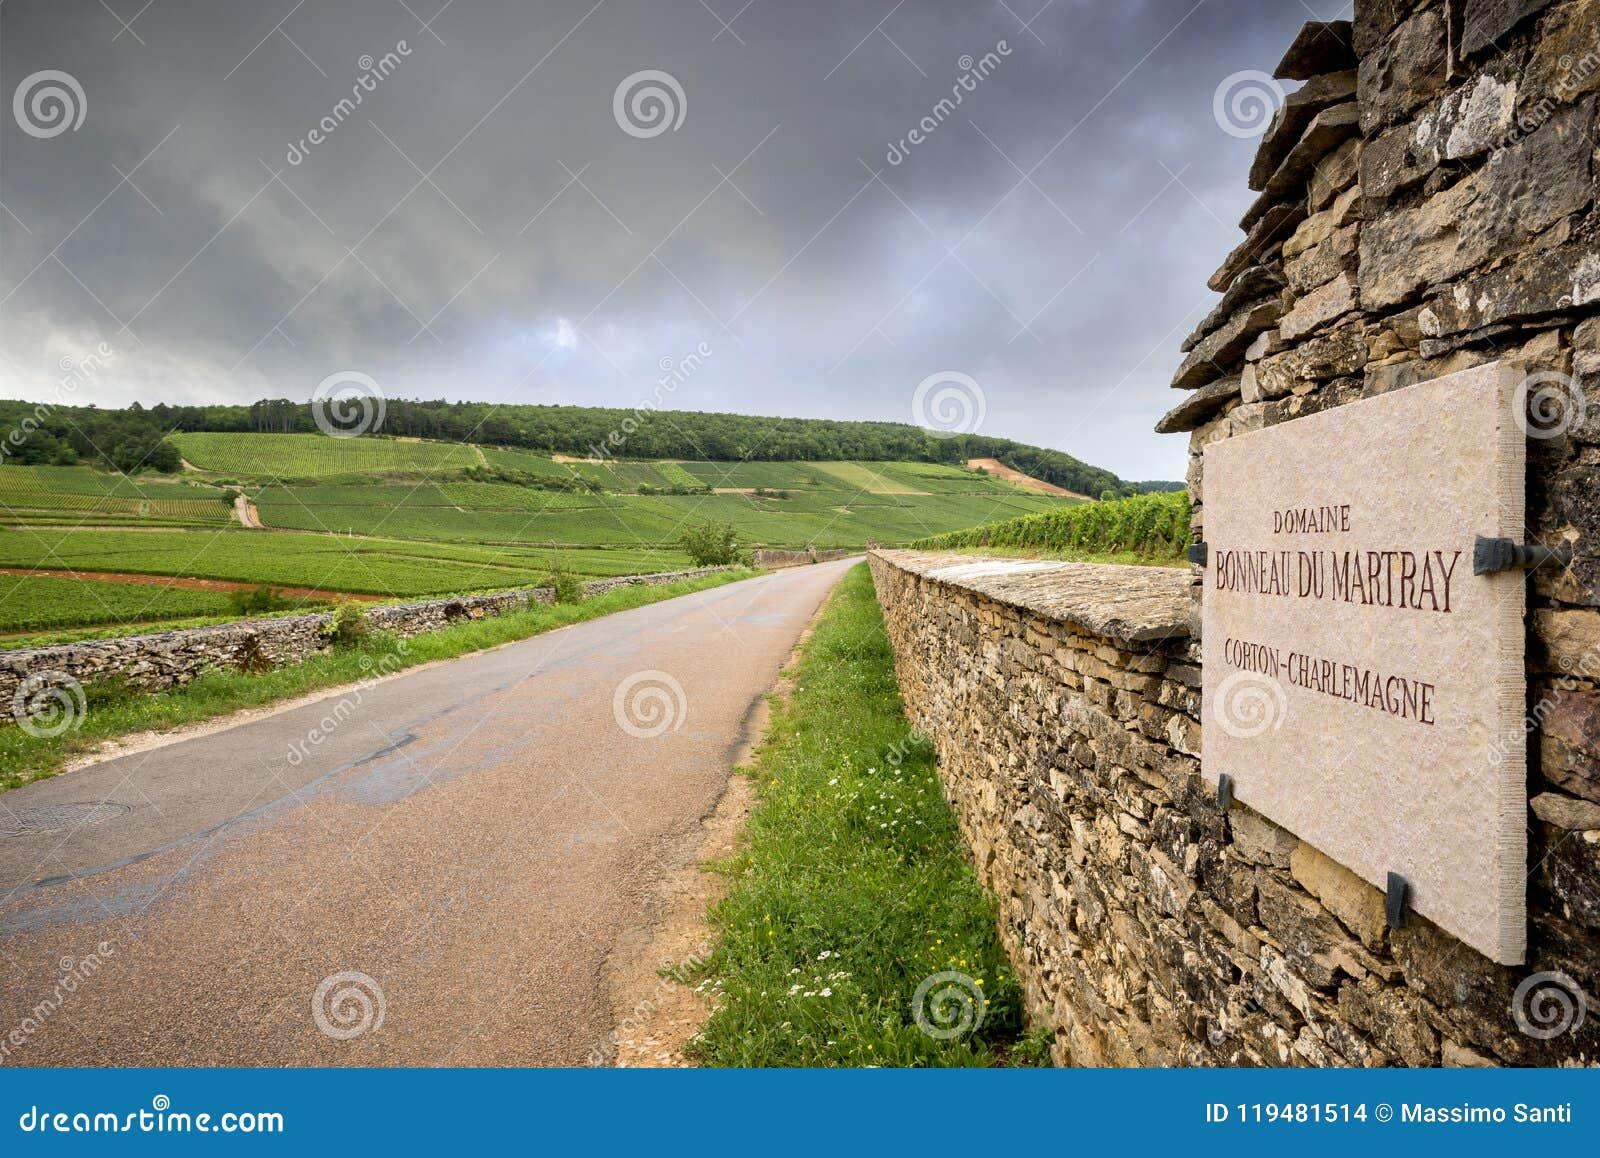 BURGUNDY - CORTON: φυσικός δρόμος που διασχίζει την περιοχή κρασιού κοντά σε Corton Γαλλία